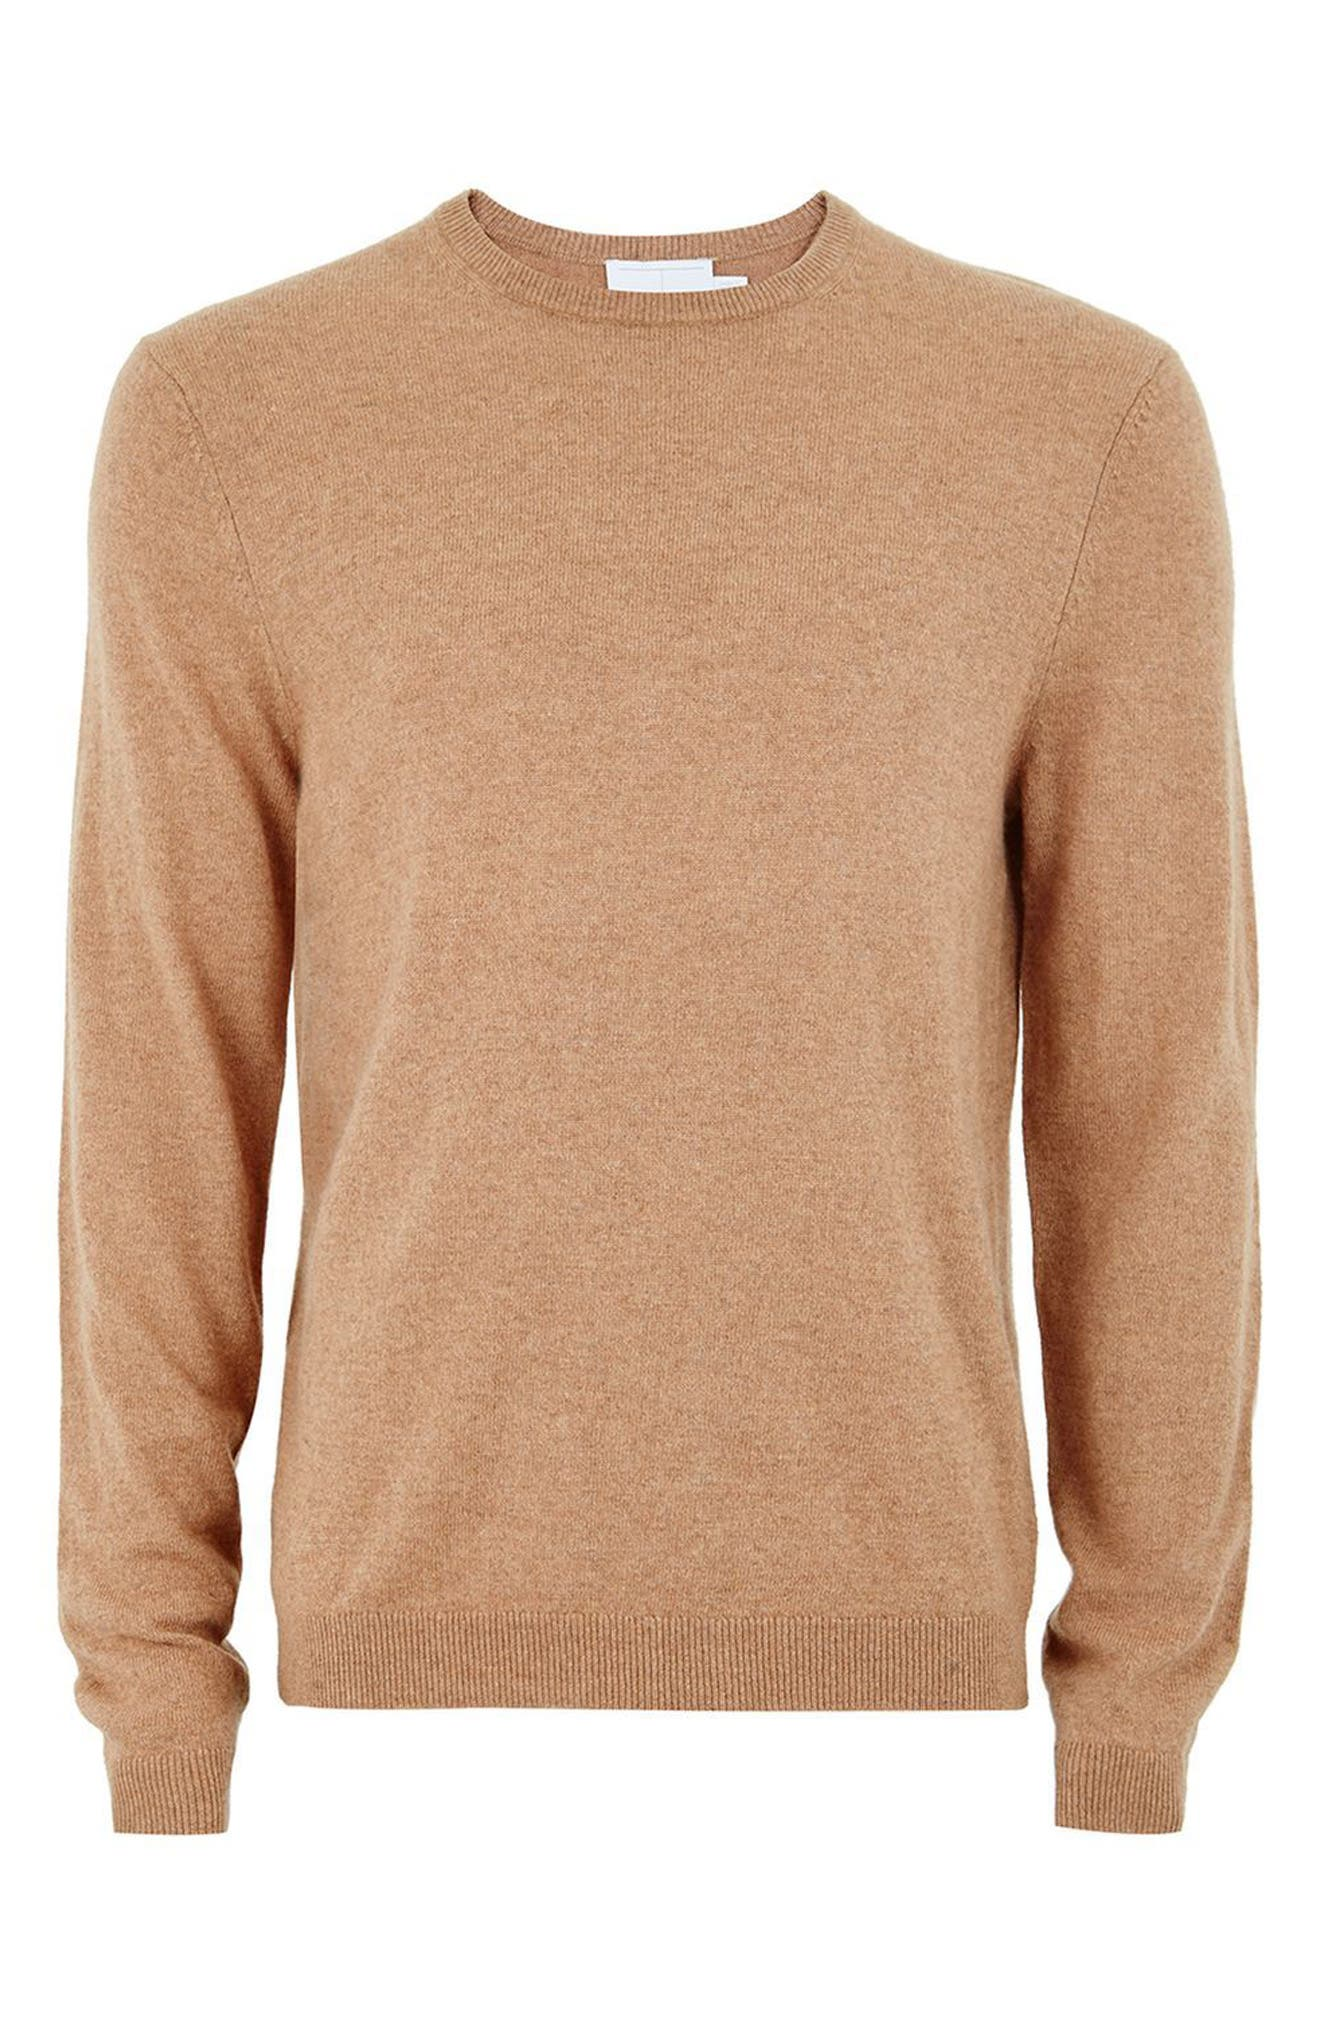 Crewneck Sweater,                             Alternate thumbnail 4, color,                             200